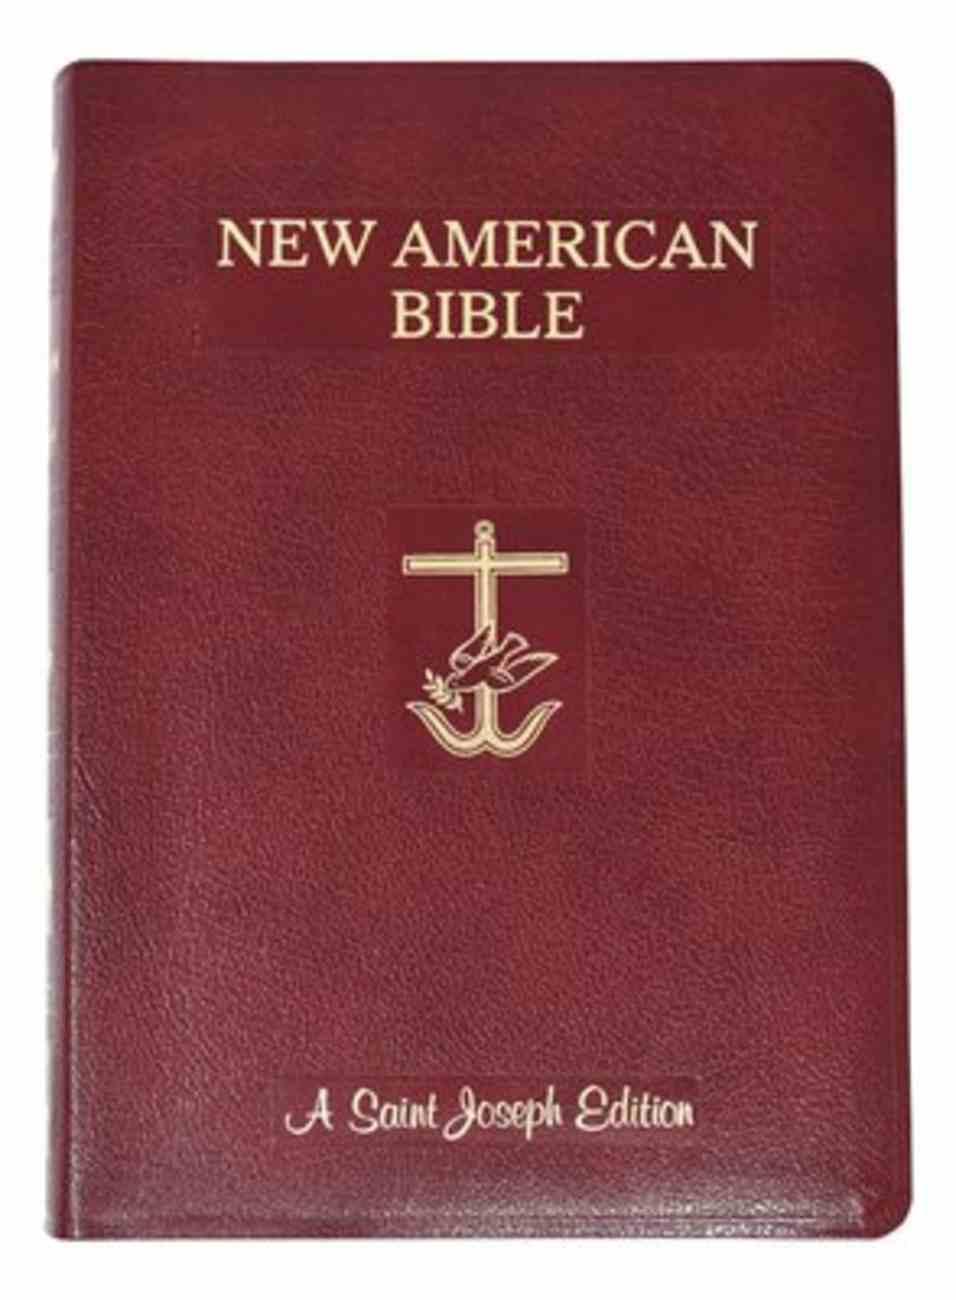 Nab St. Joseph New American Bible Giant Print Burgundy Bonded Leather